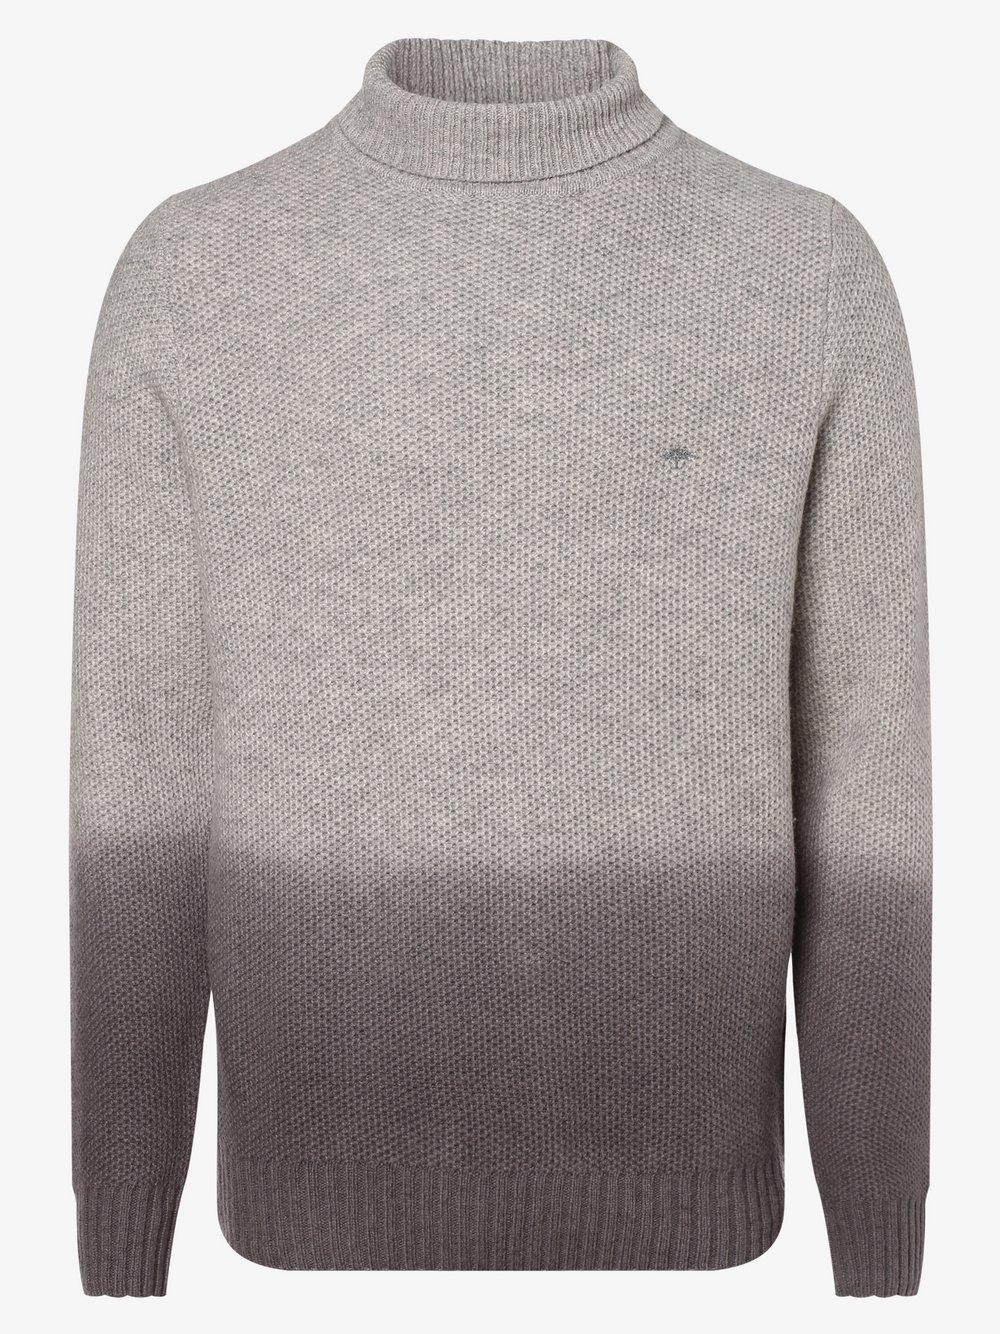 Fynch-Hatton – Sweter męski, szary Van Graaf 447150-0002-09940